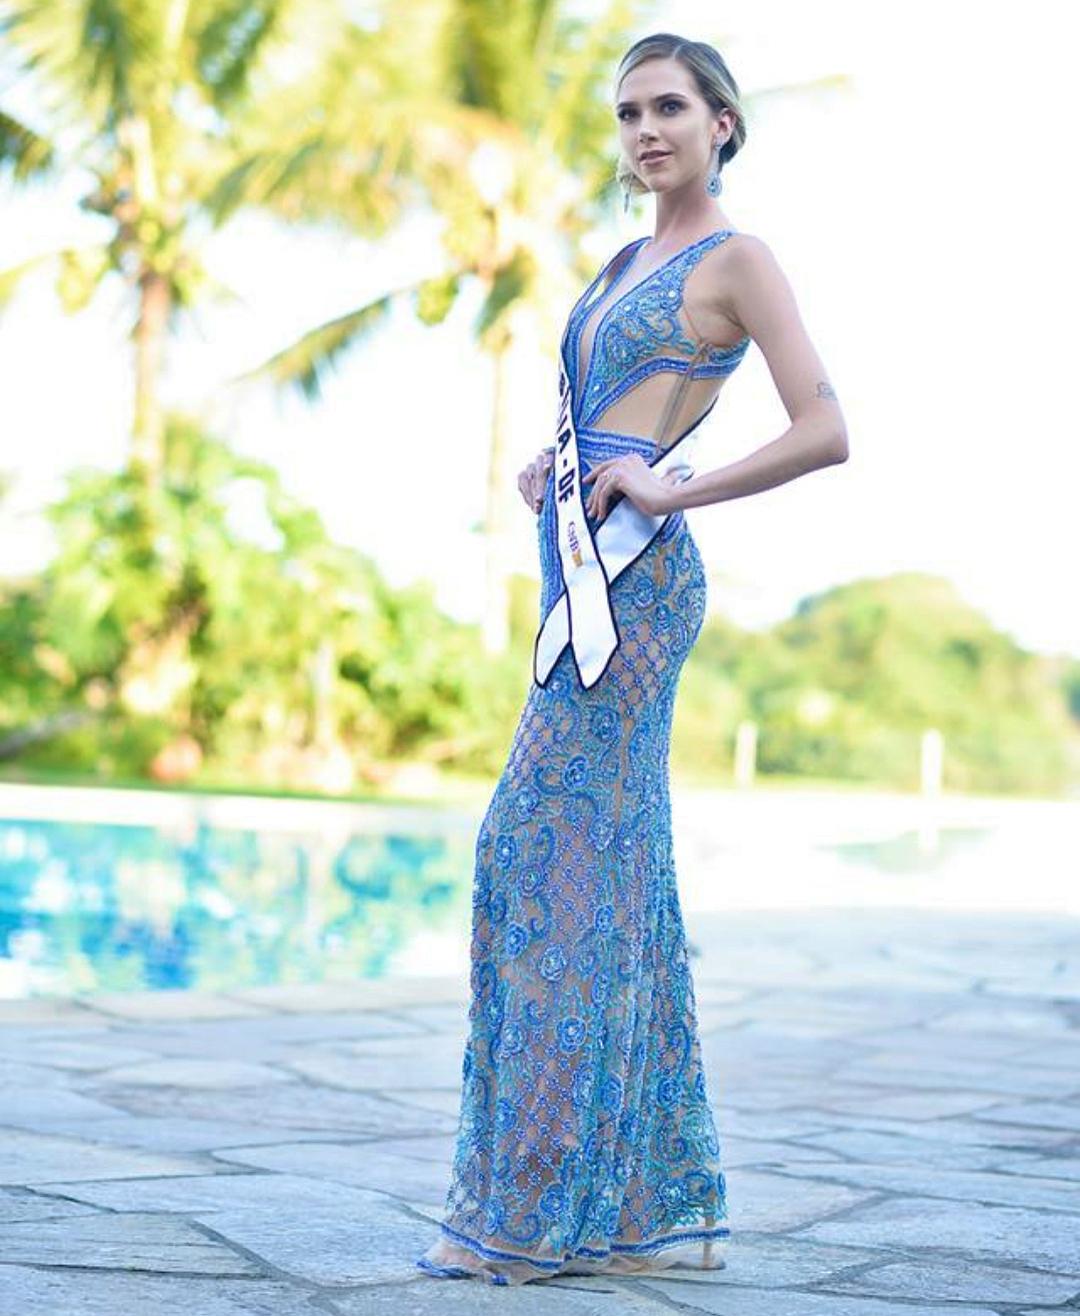 isabela schott, miss brasilia mundo 2018. - Página 3 37925411